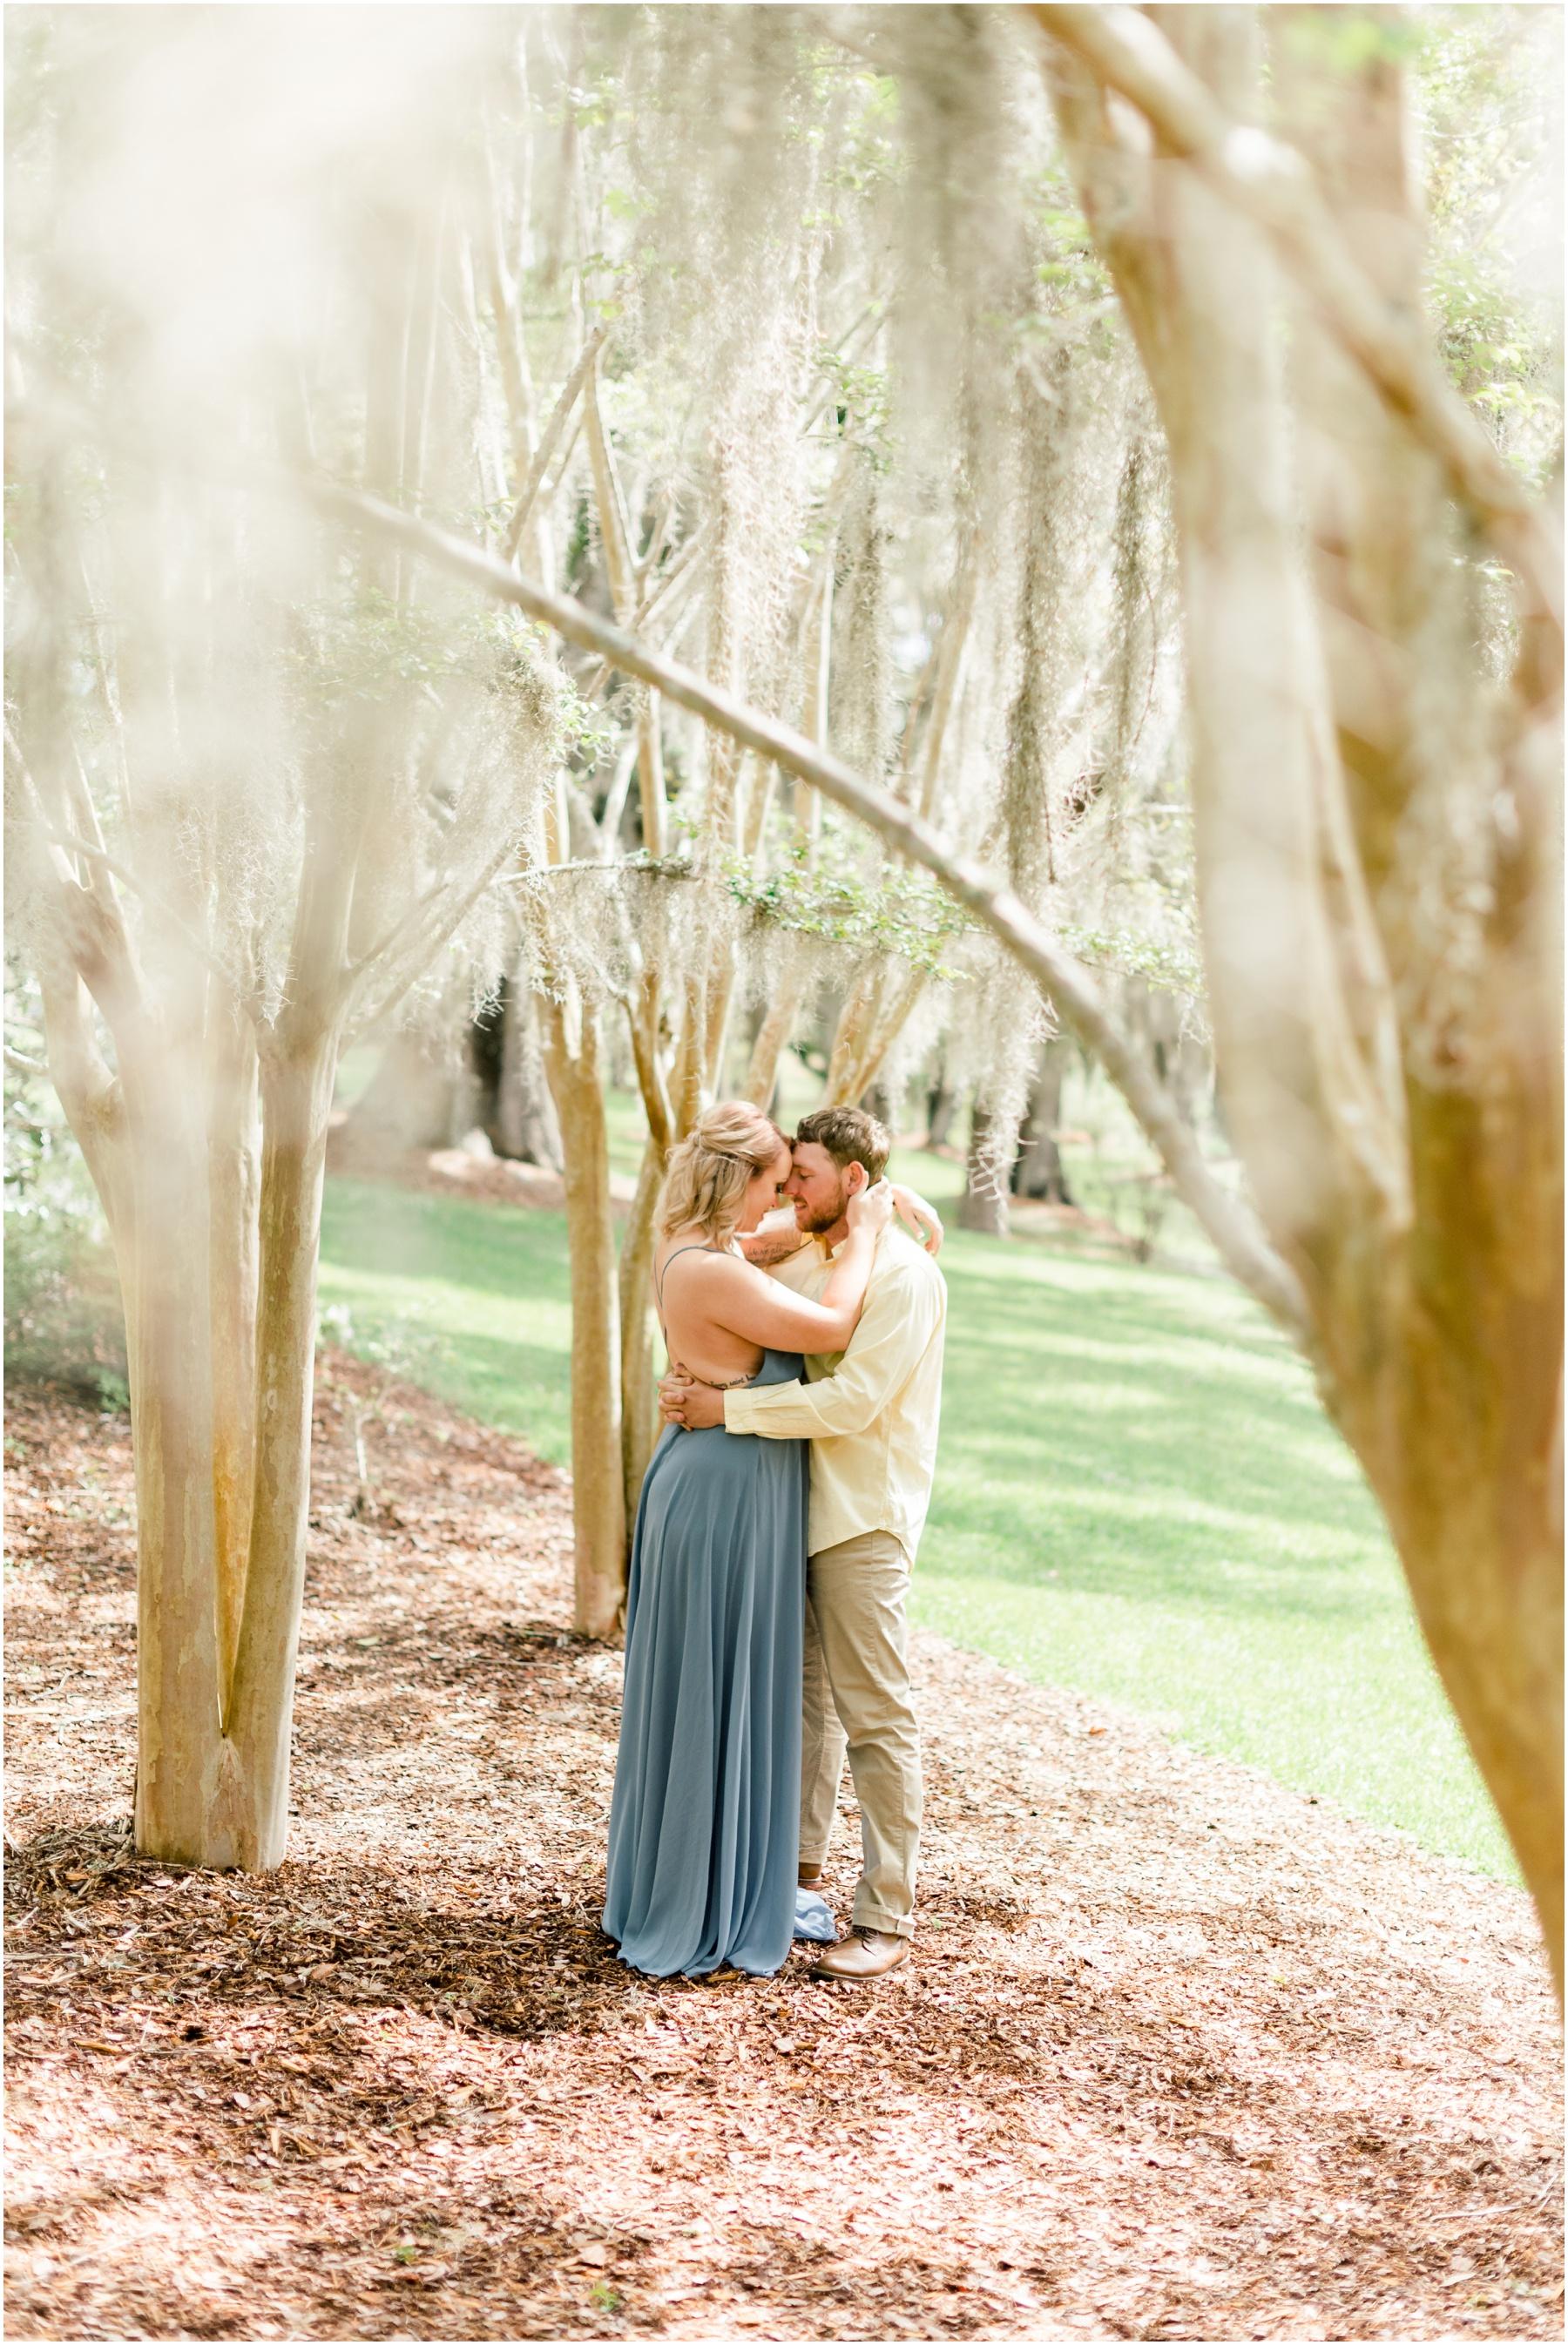 Mepkin-Abbey-Moncks-Corner-South-Carolina-Engagement-Session-Photos_0006.jpg